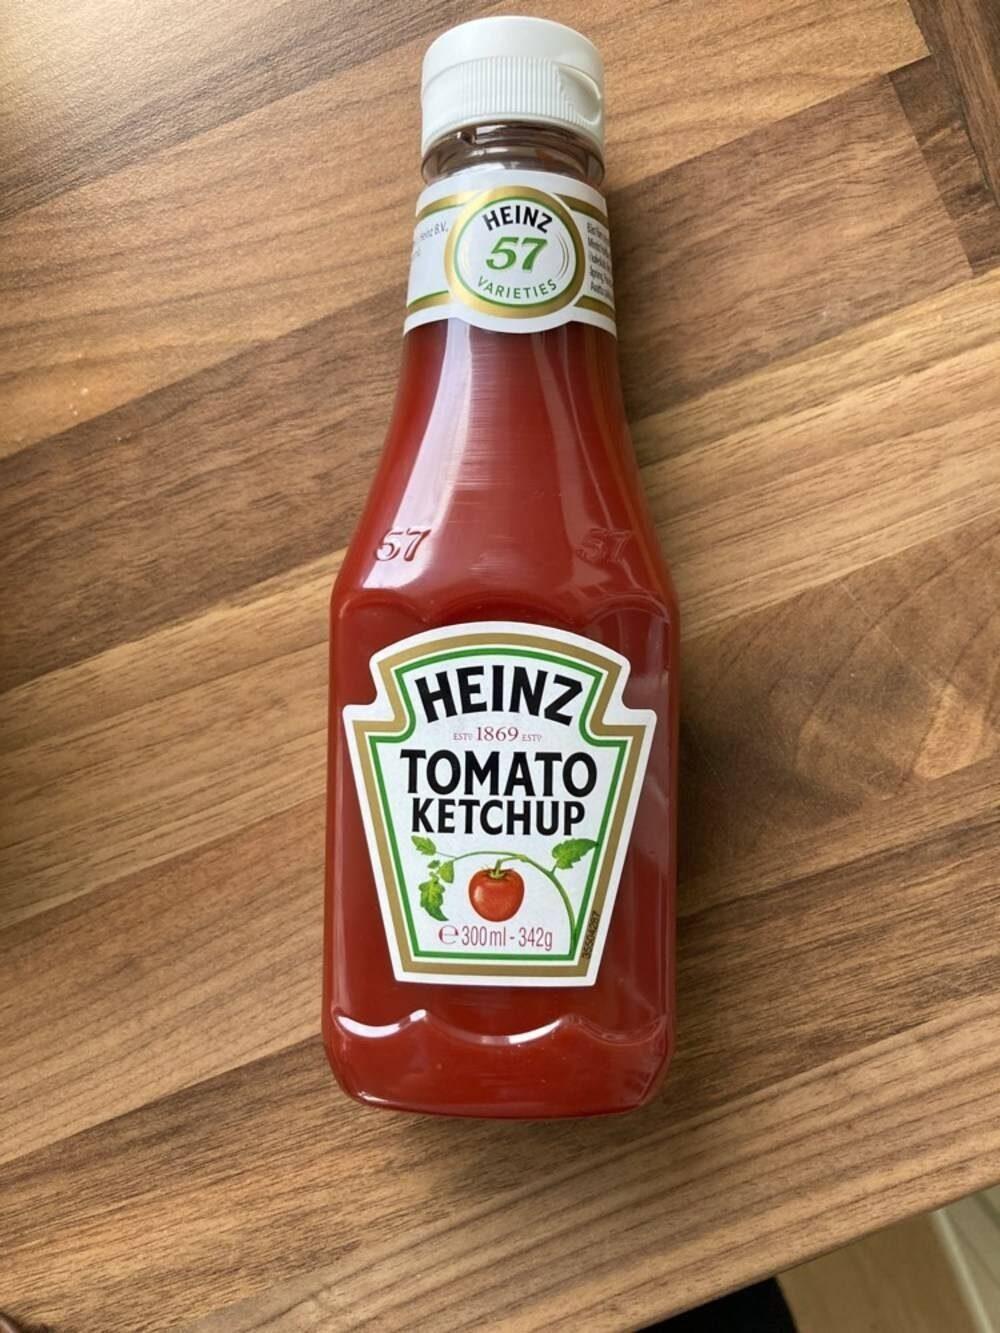 Heinz Tomato Ketchup - Product - en